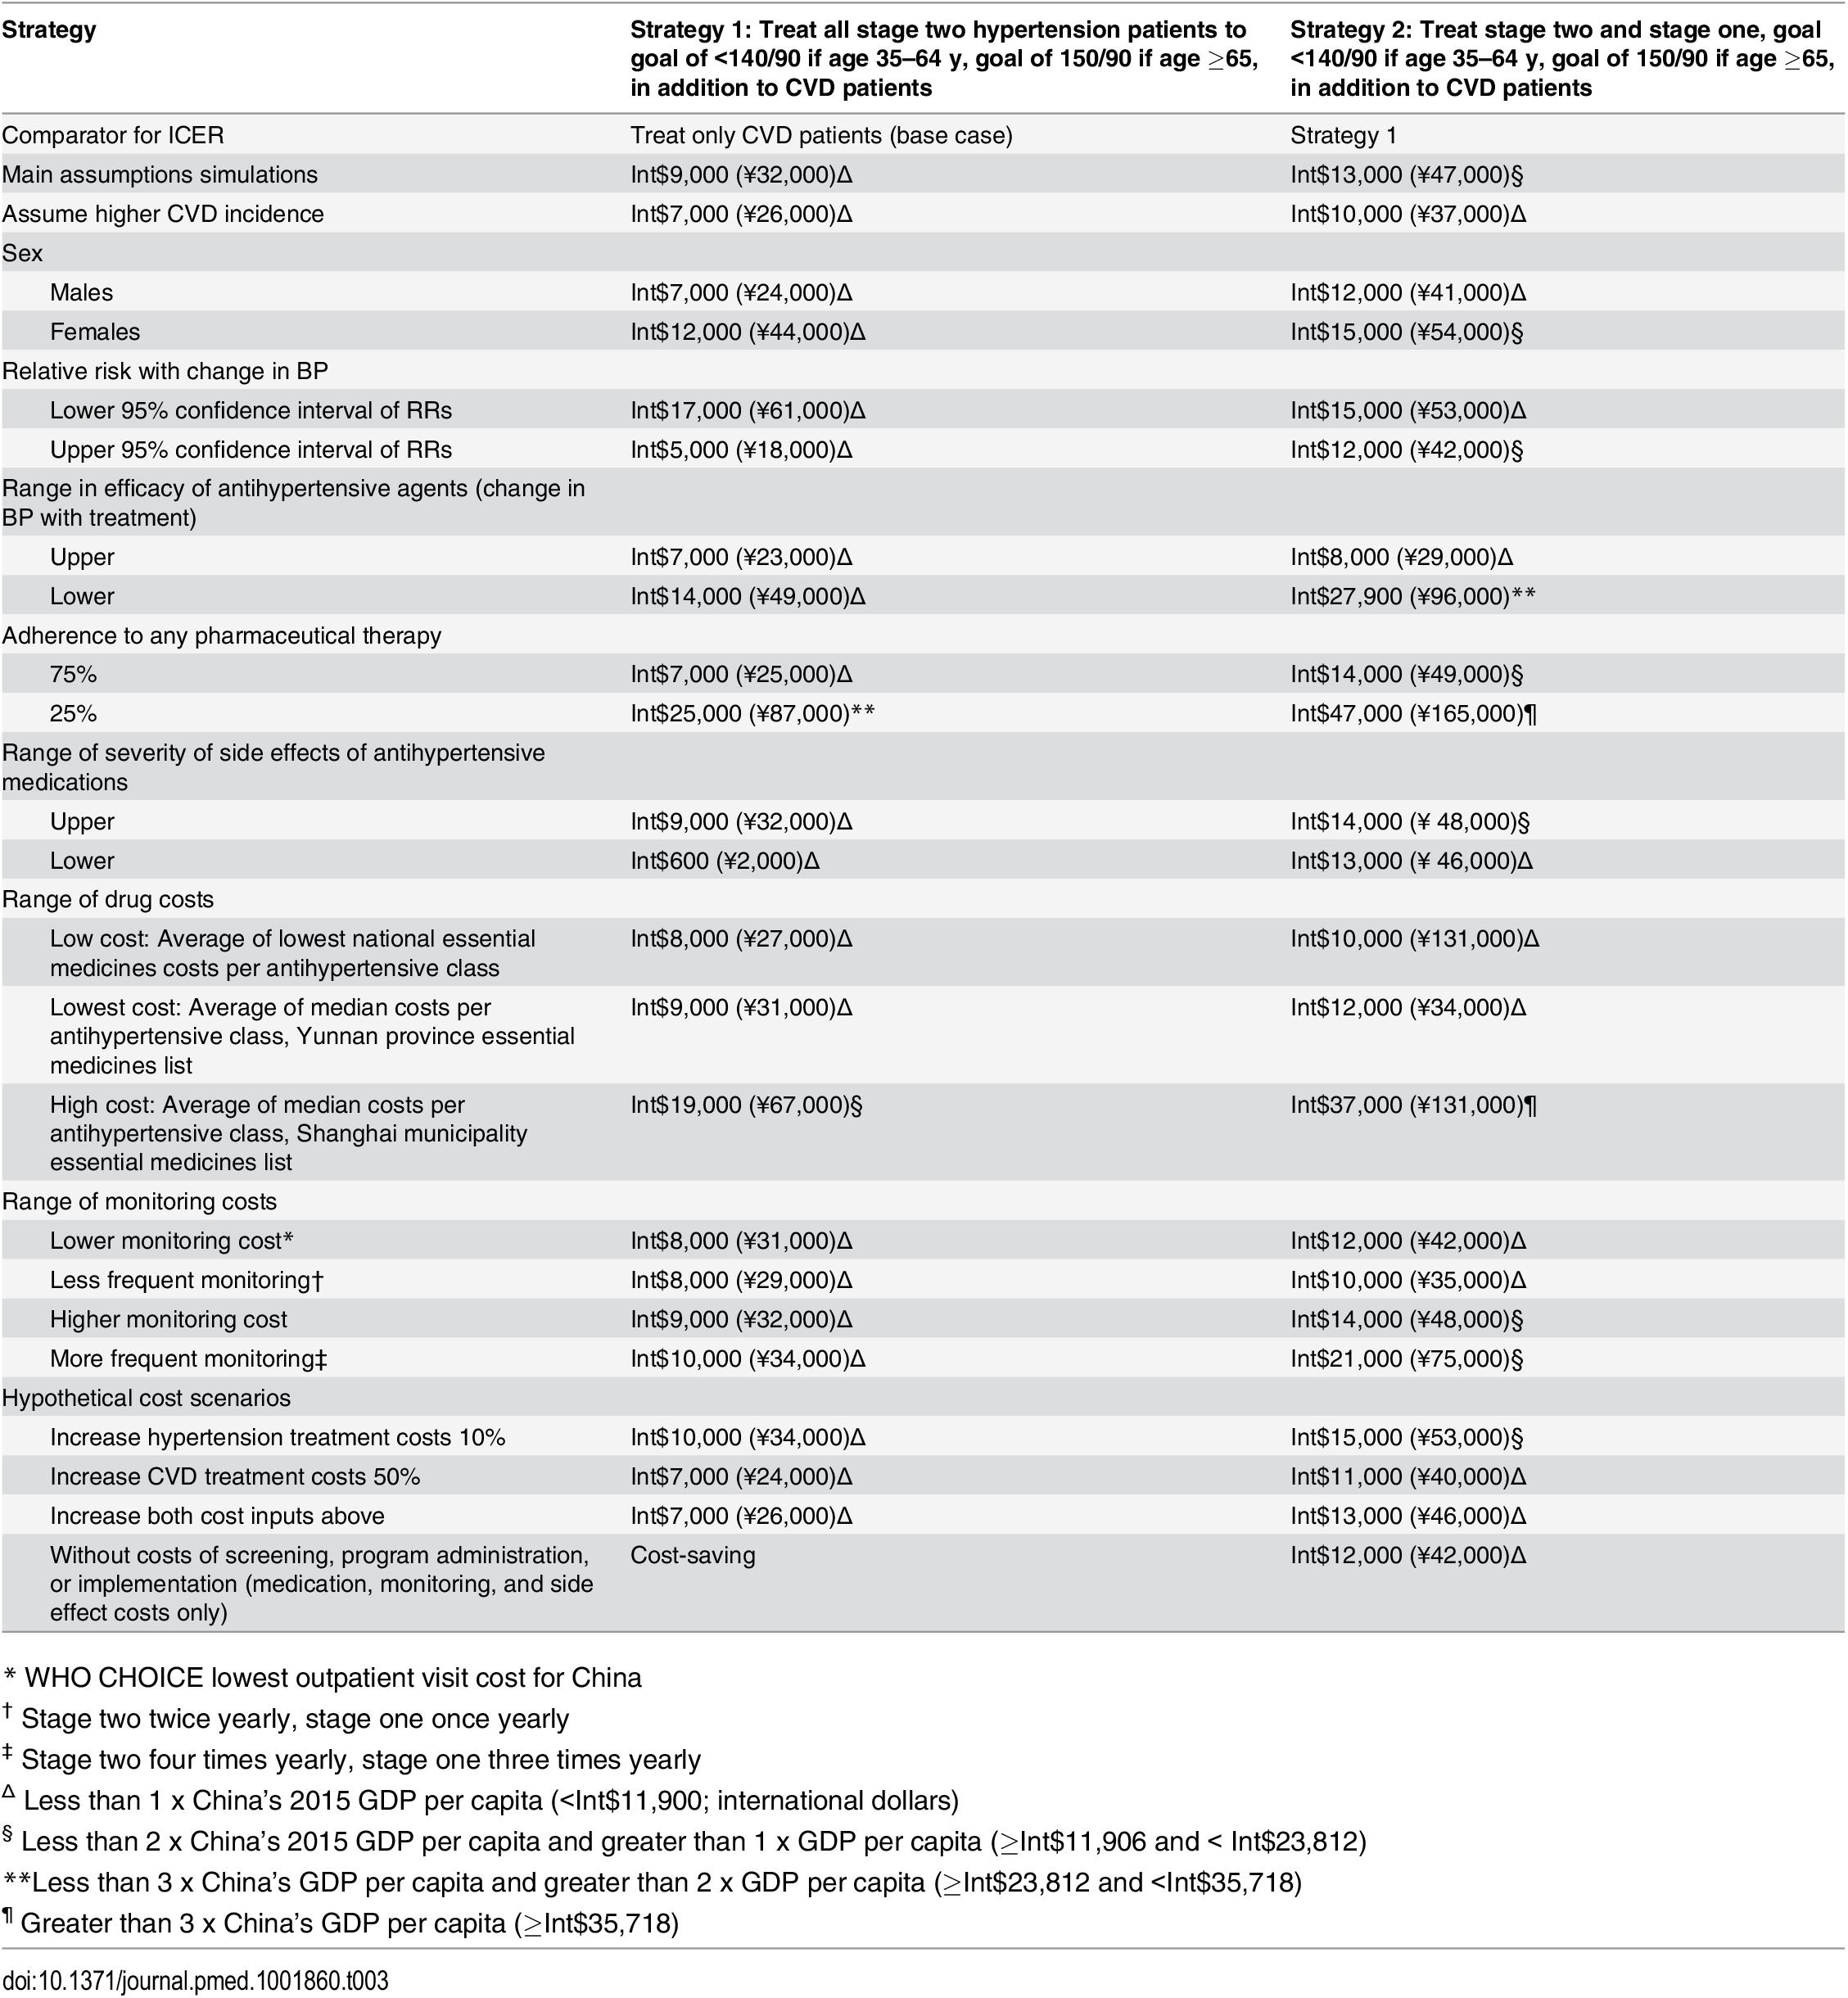 One-way sensitivity analysis of hypertension treatment inputs.